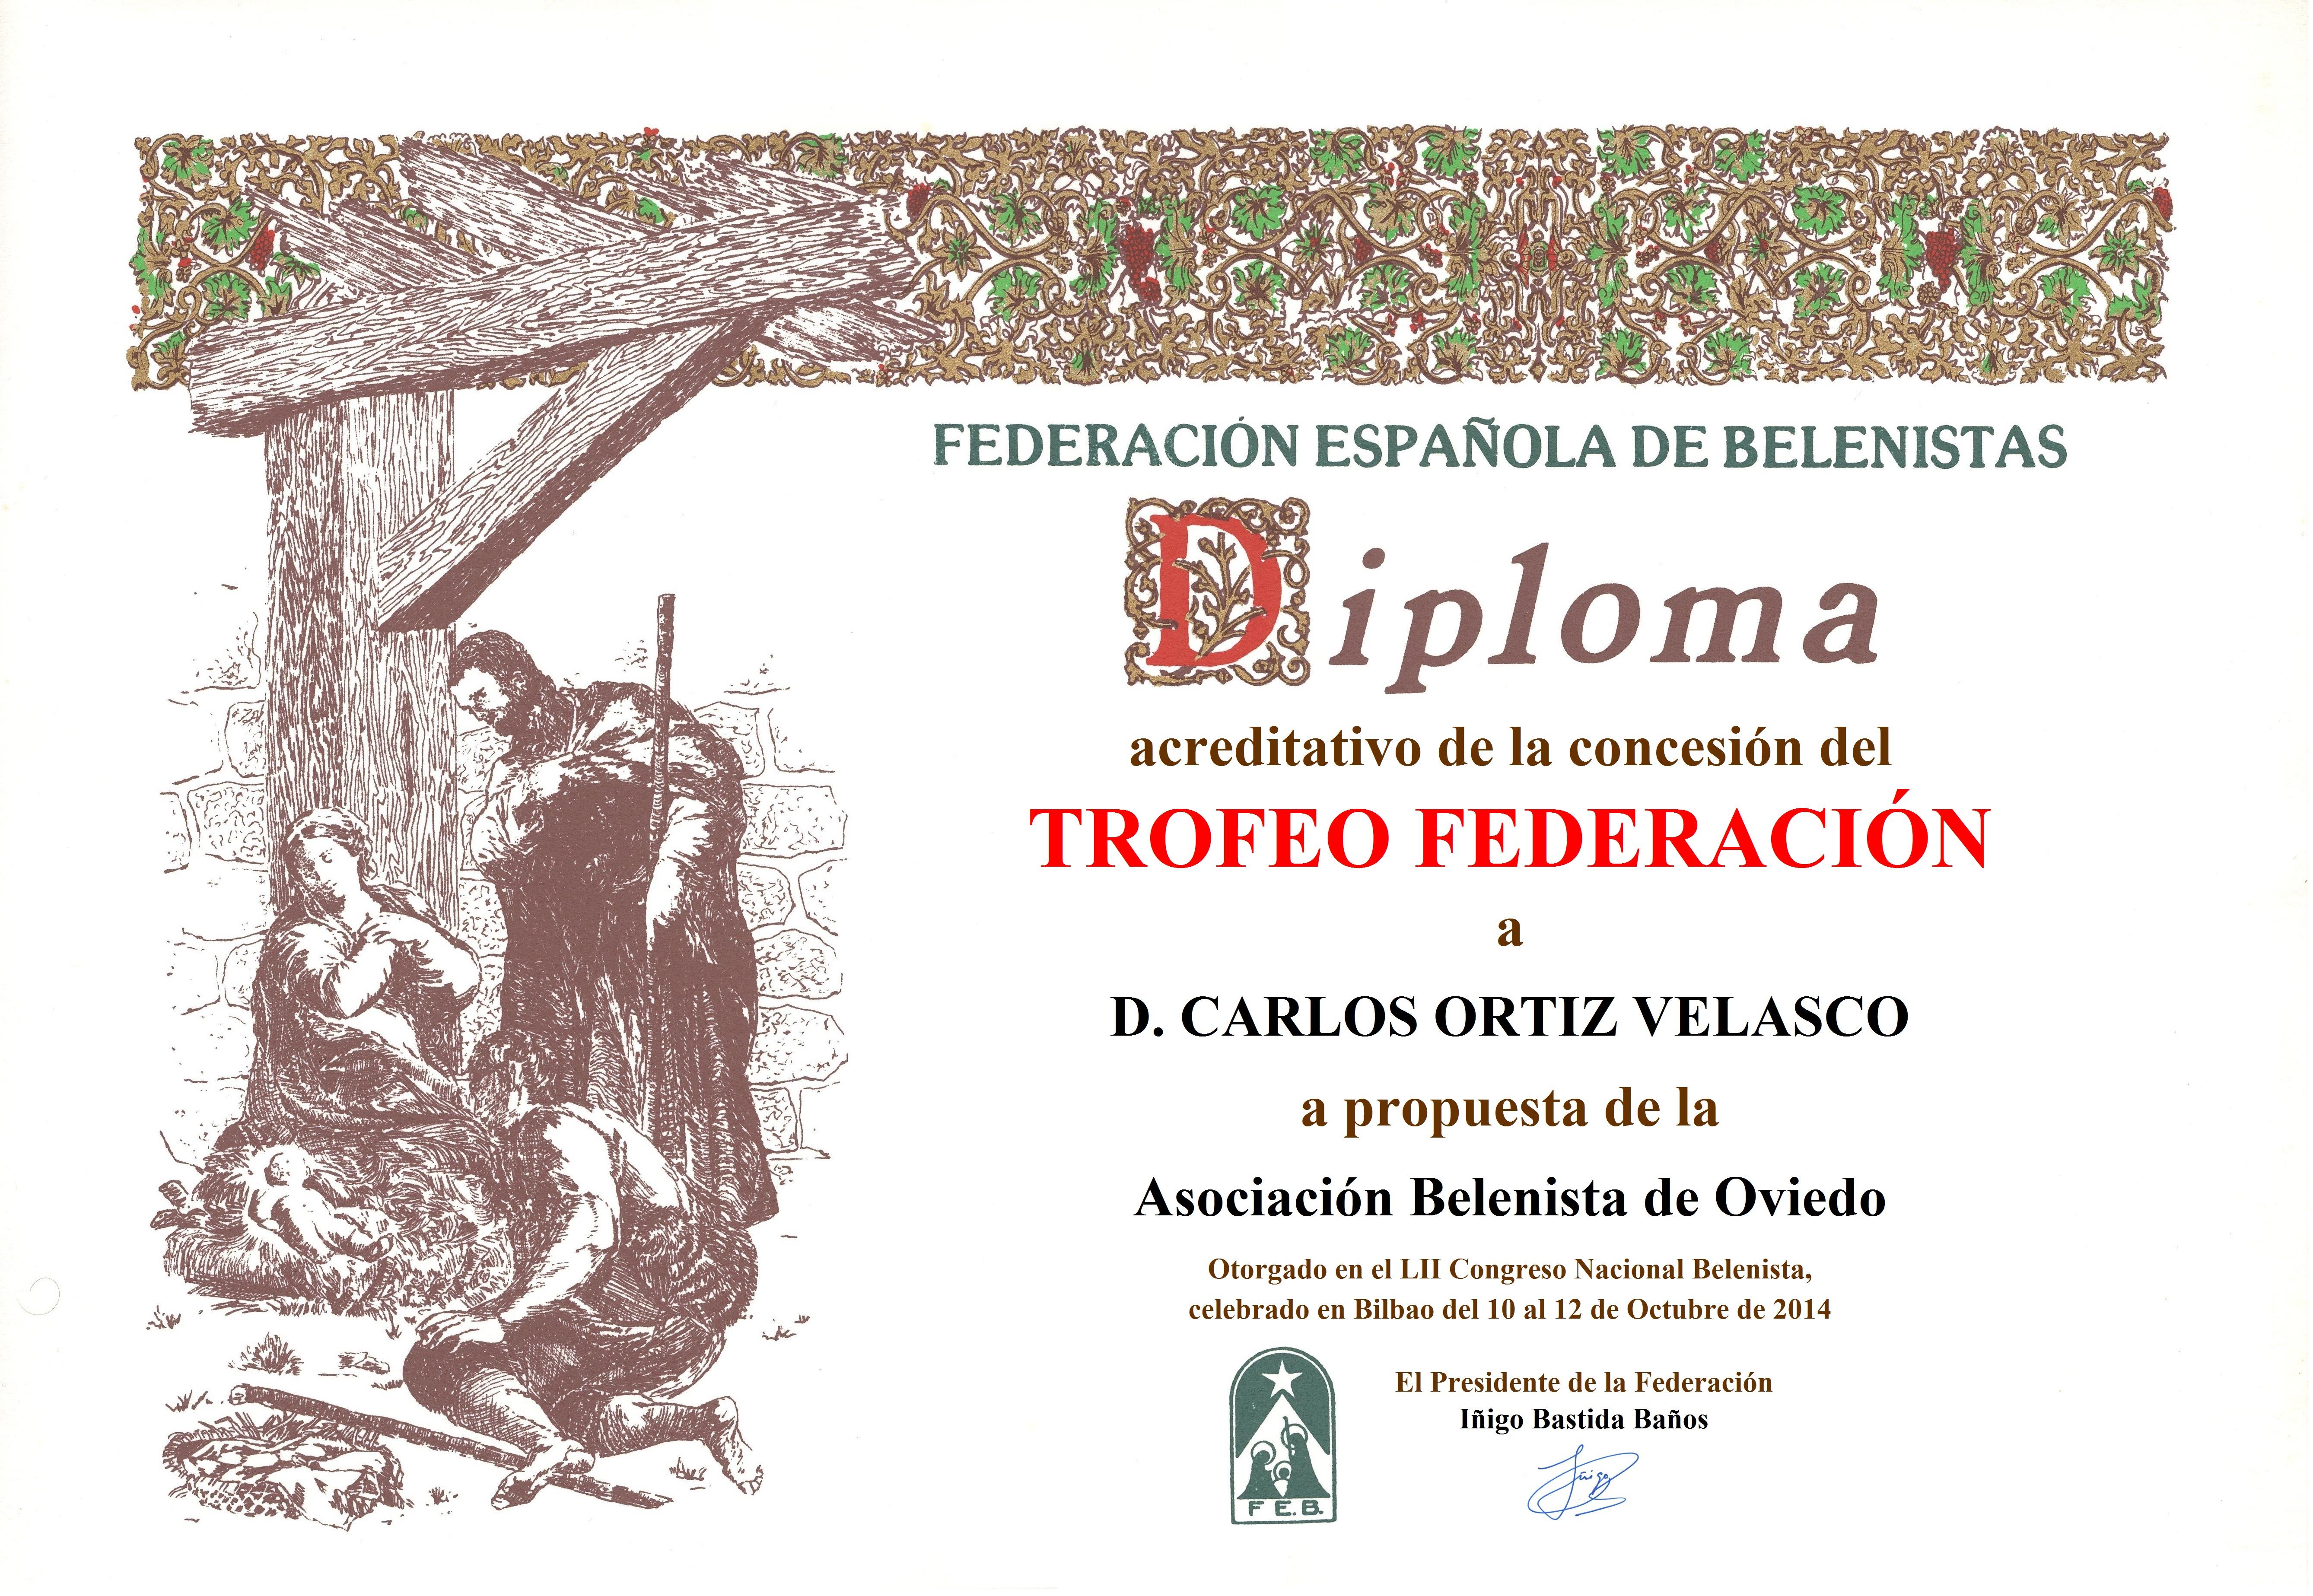 Diploma Trofeo FEB 2014 Carlos Ortiz Velasco